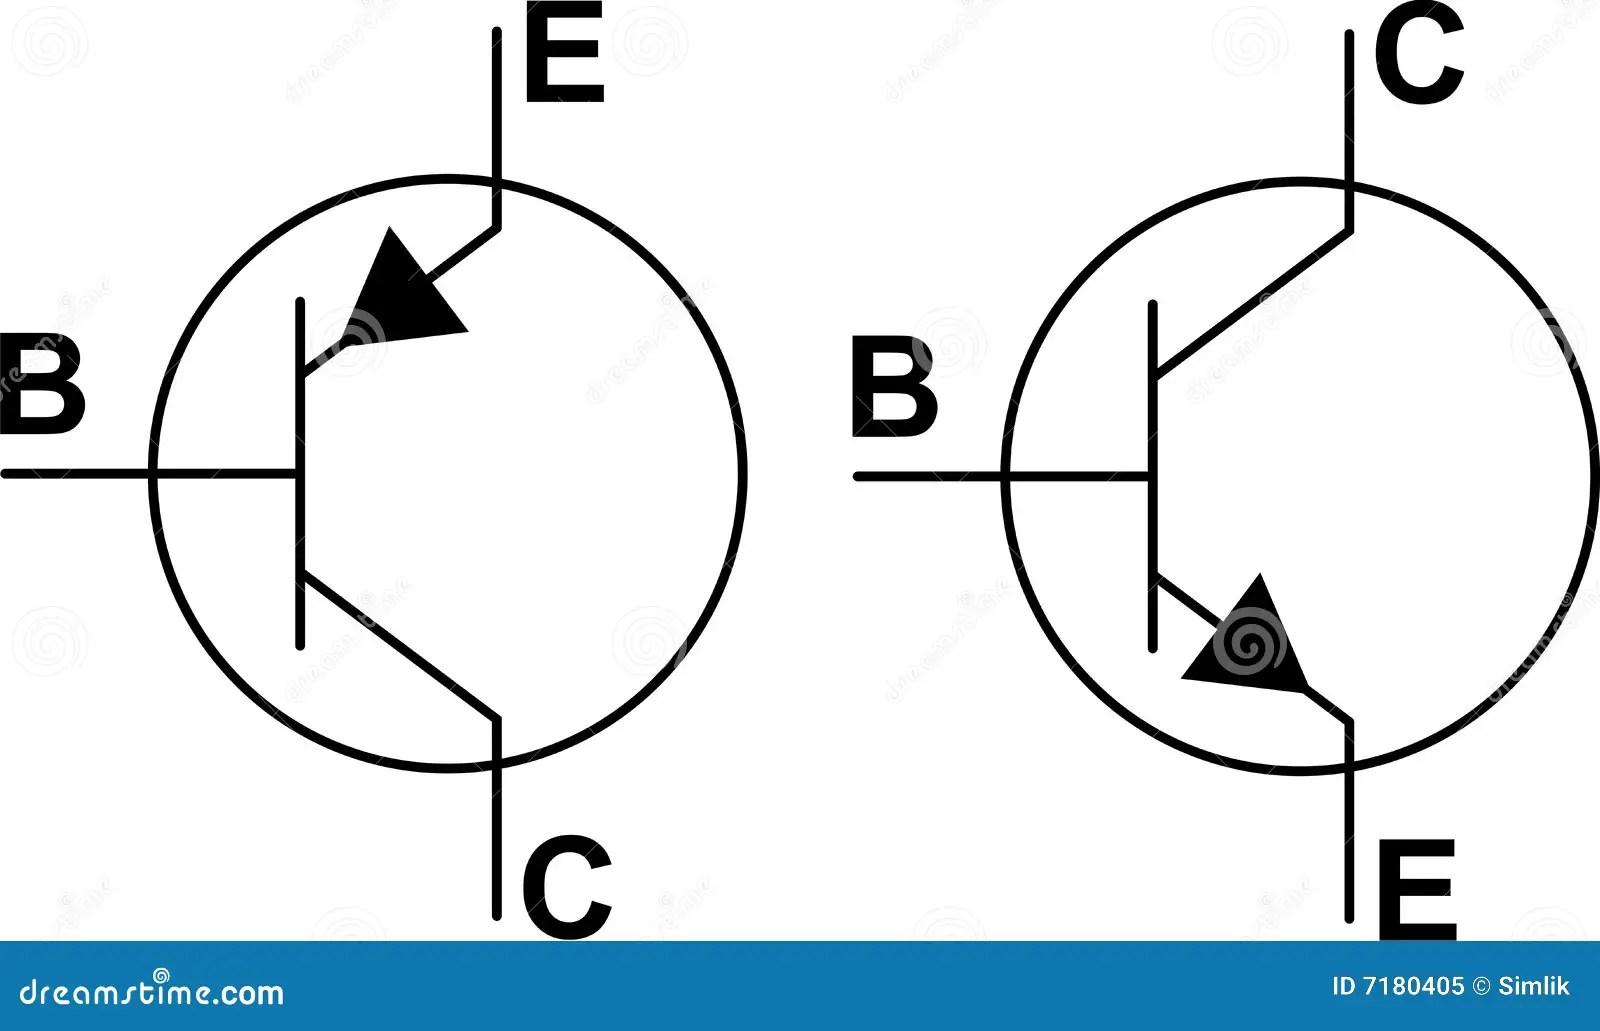 Simbolos Del Transistor Npn Pnp Foto De Archivo Libre De